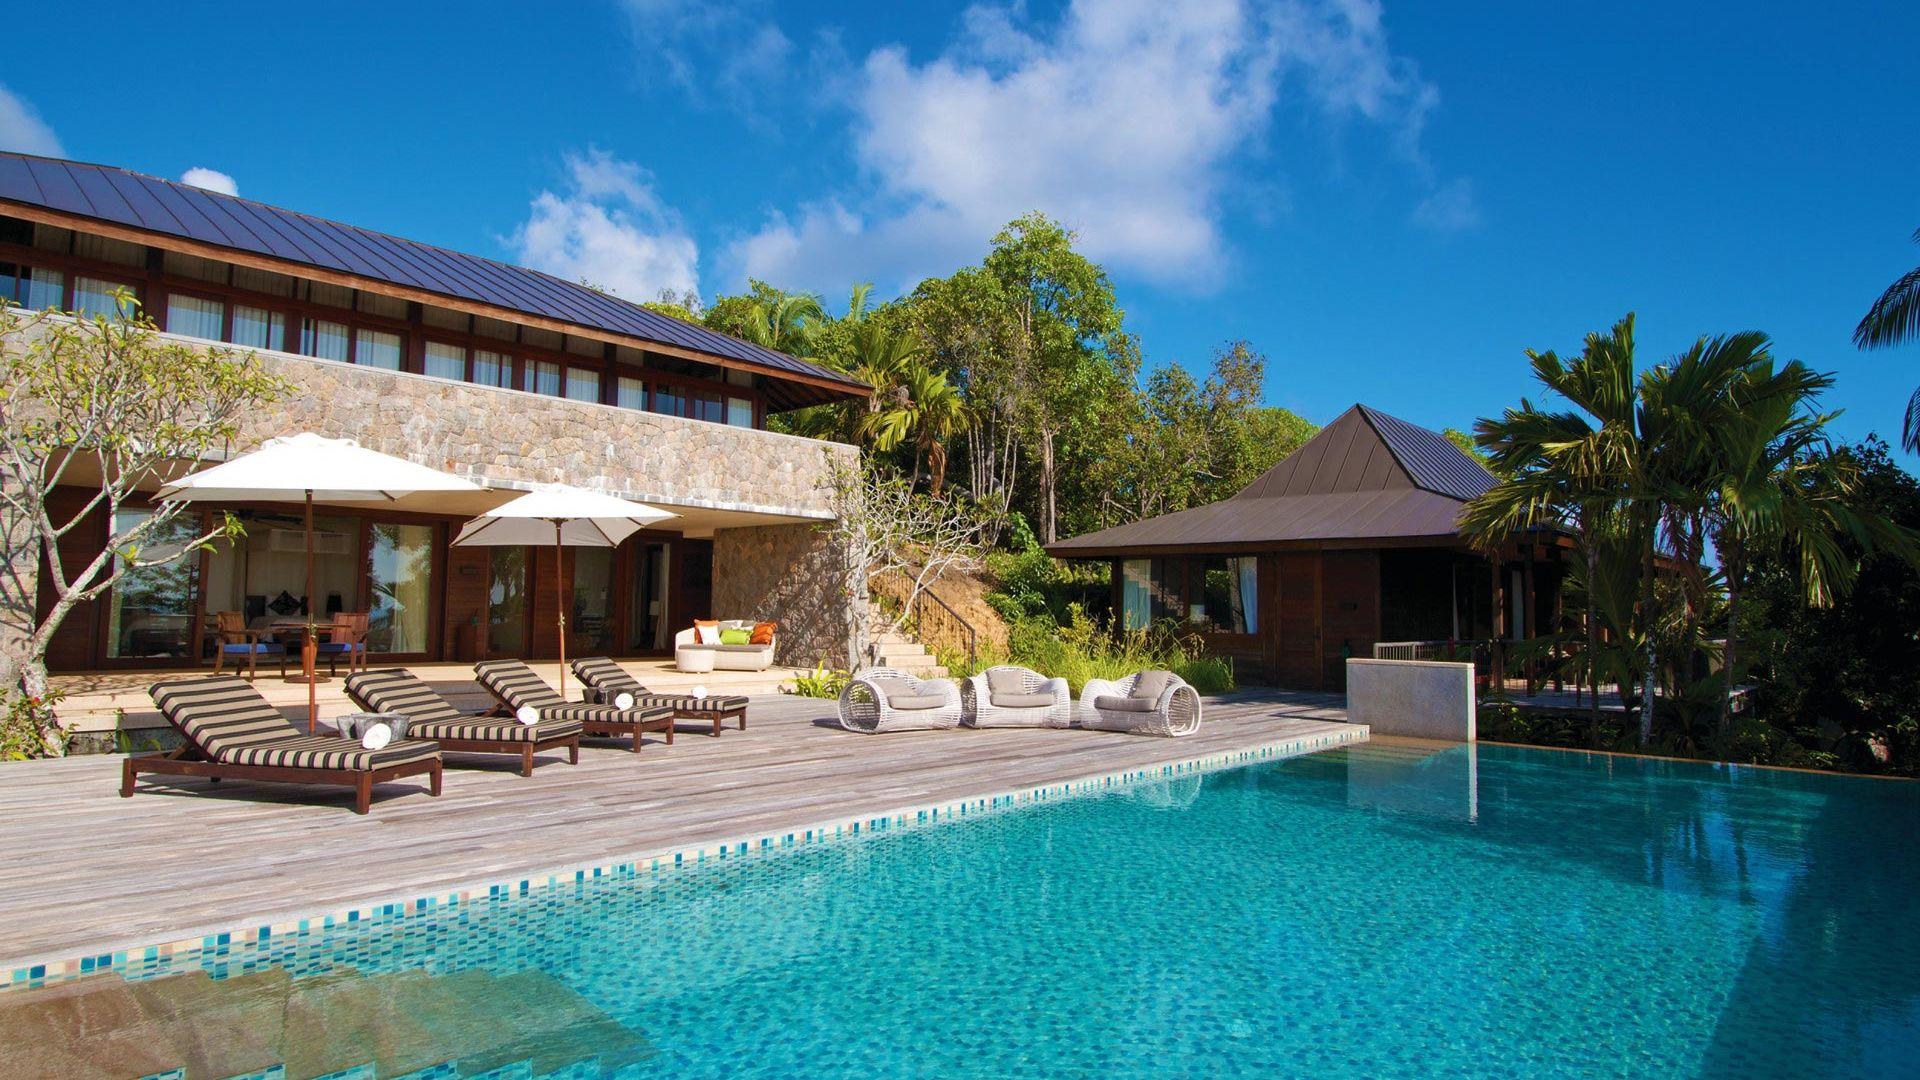 Sejur plaja Four Seasons Resort 5* Seychelles, 9 zile - august 2021